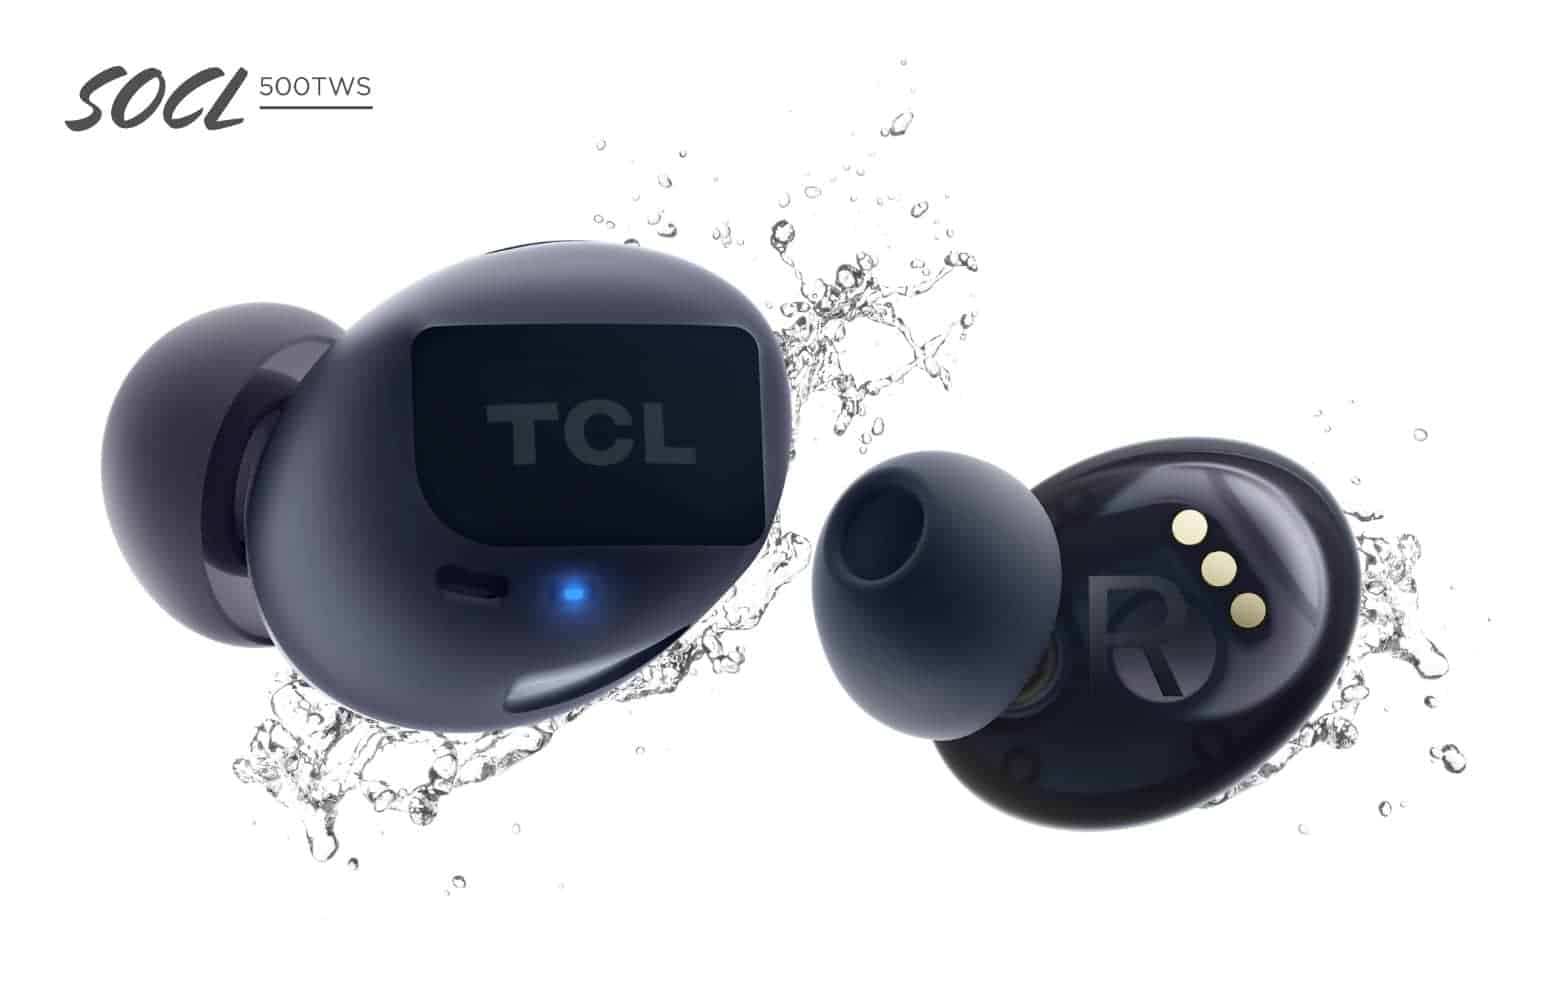 SOCL500TWS 01 TCL smart device